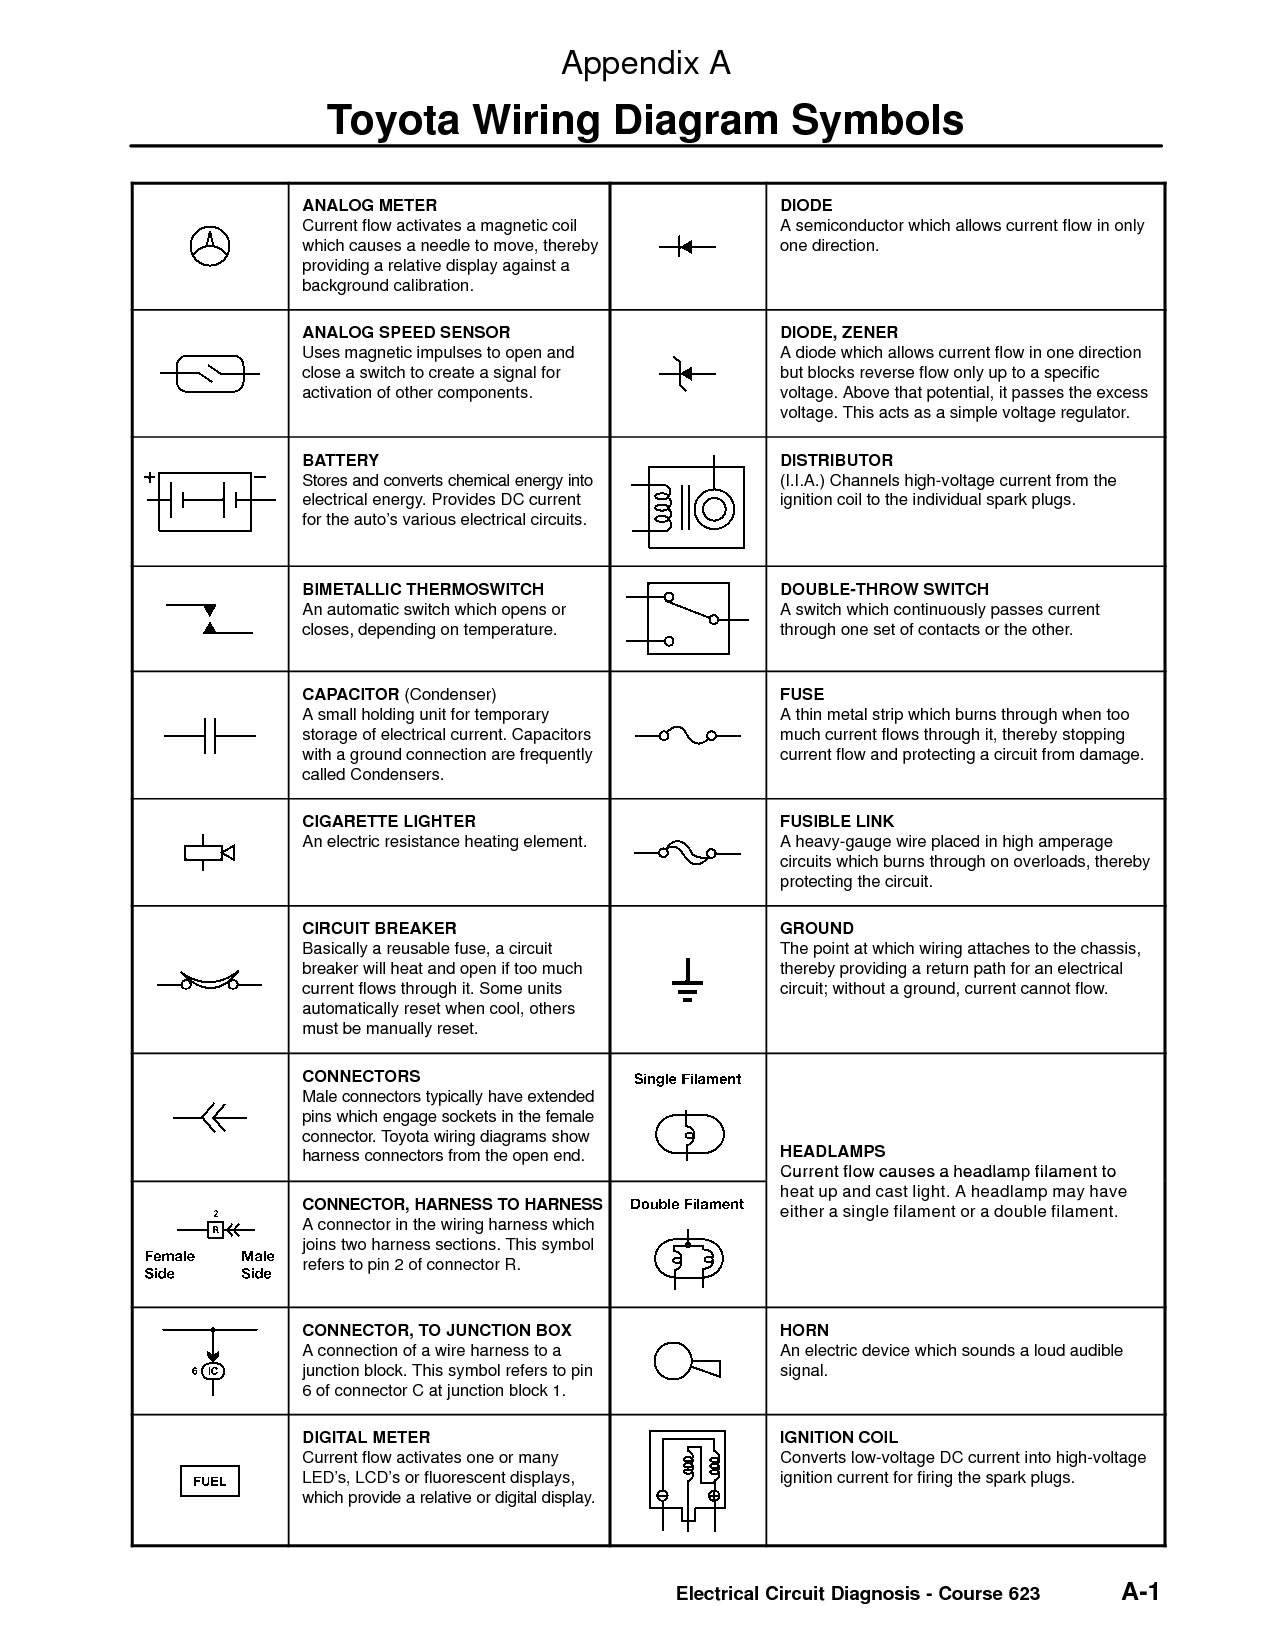 Electrical Wiring Diagram Legend Electrical wiring